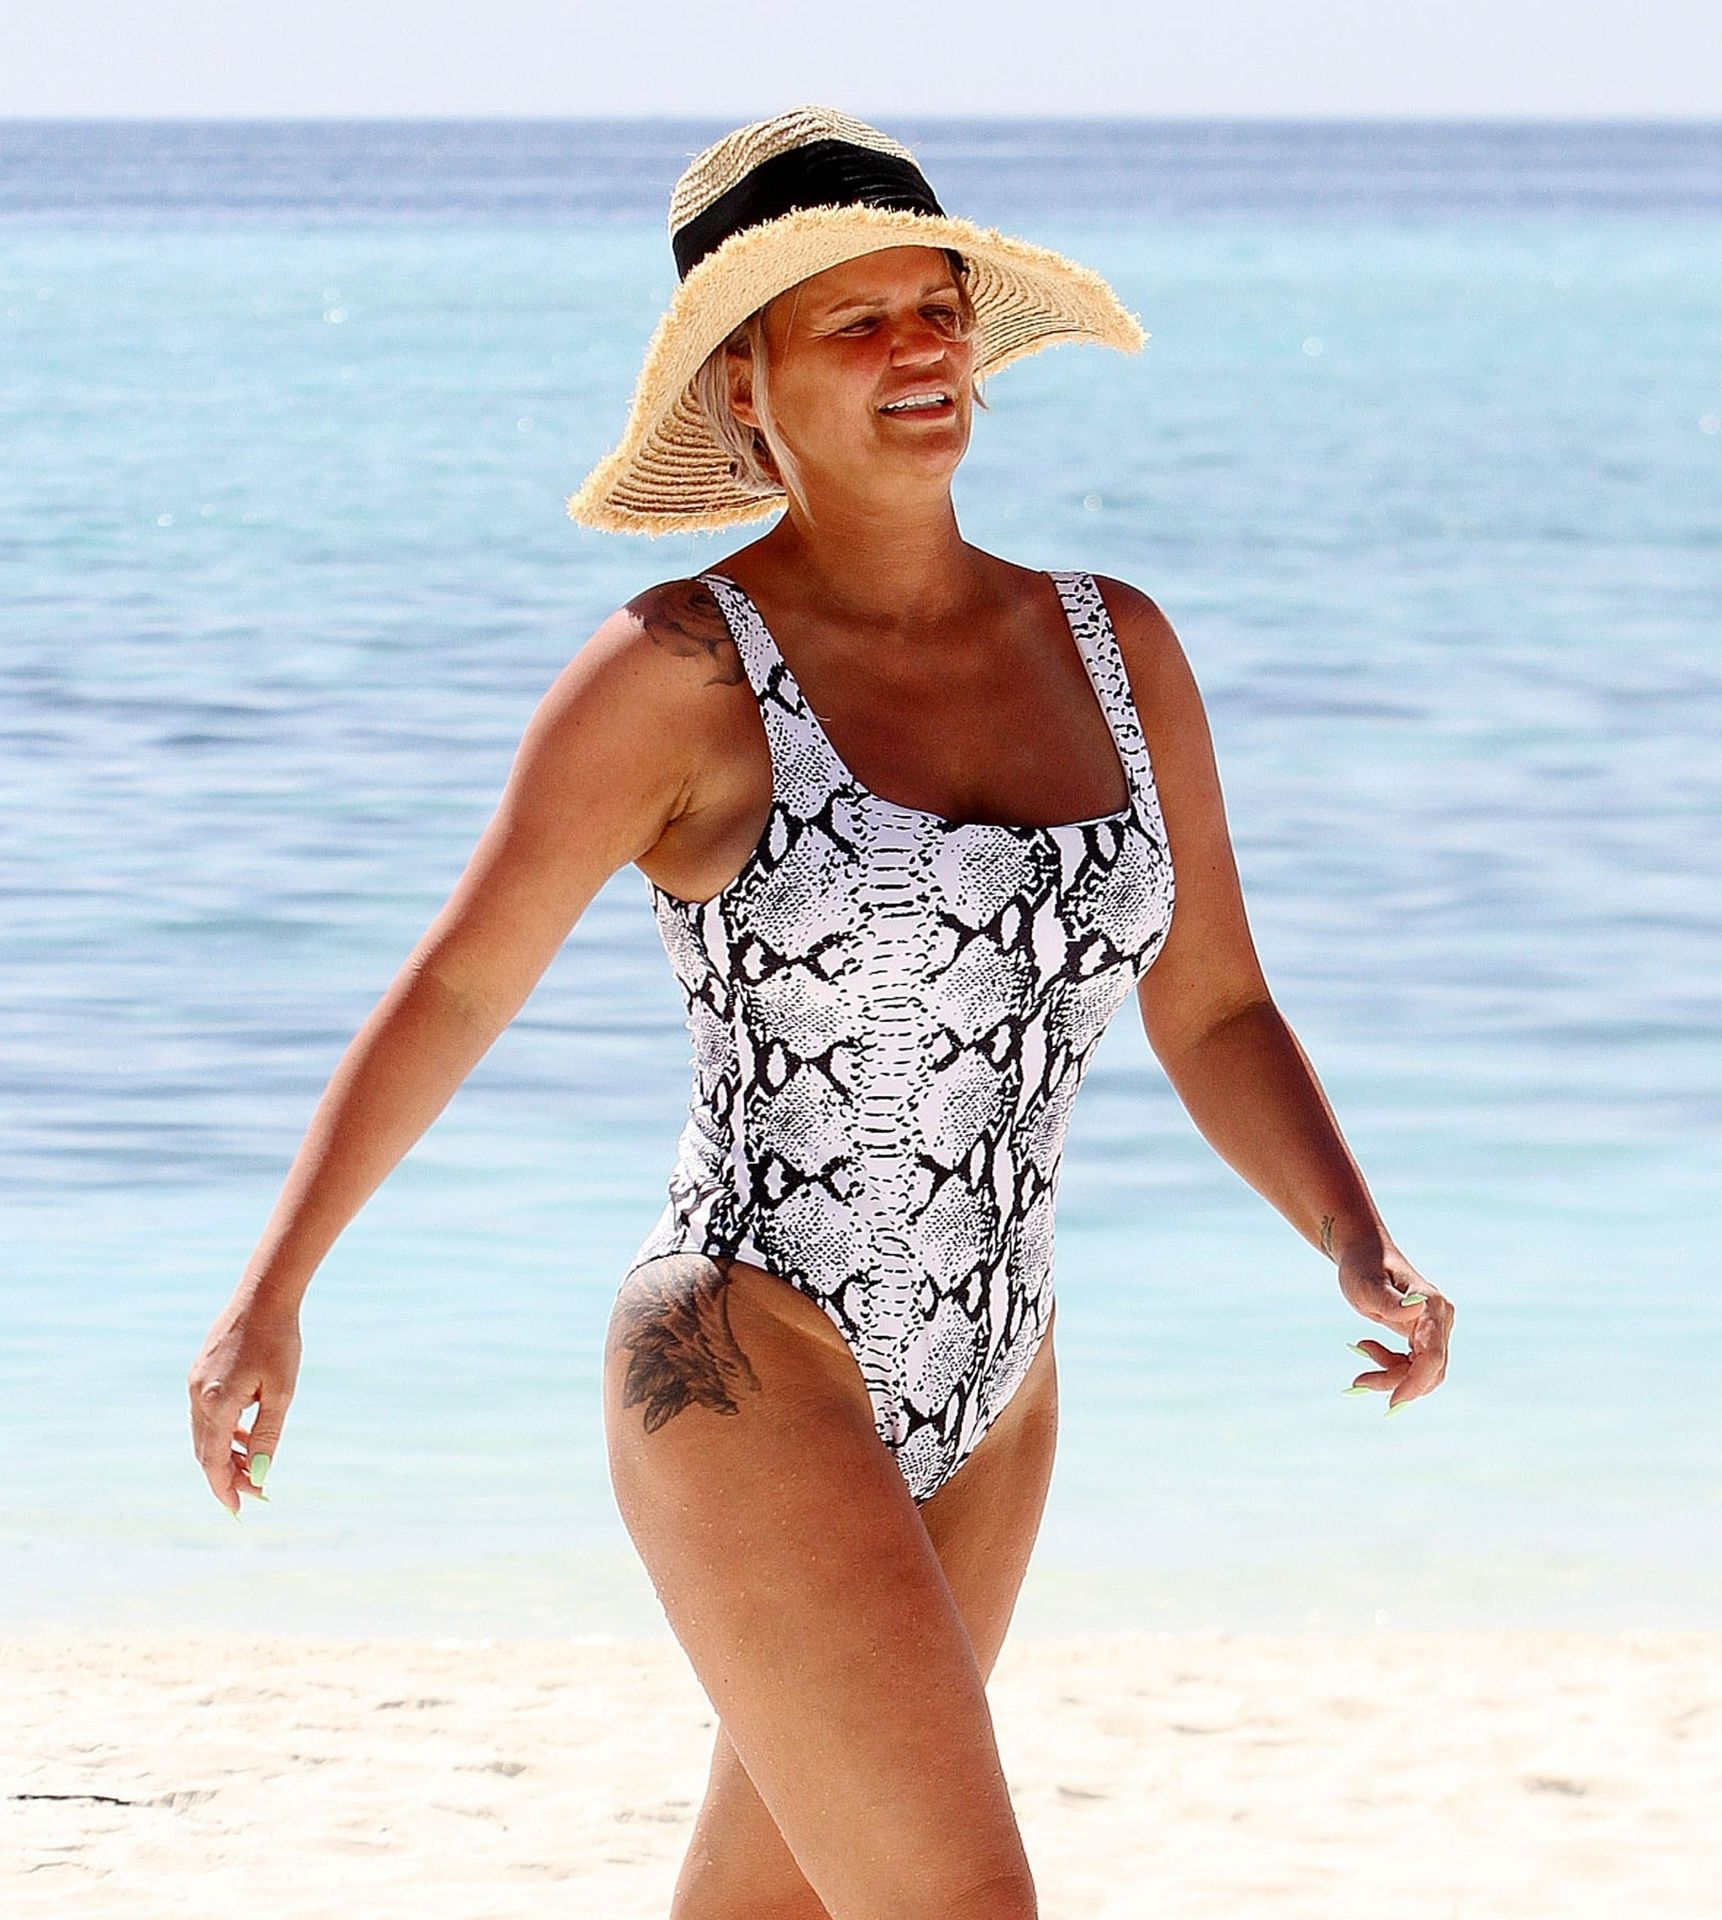 Kerry Katona & Ryan Mahoney Hit The Beach On Holiday At Their Luxury 5 Star Resort Ayada Maldives 0007